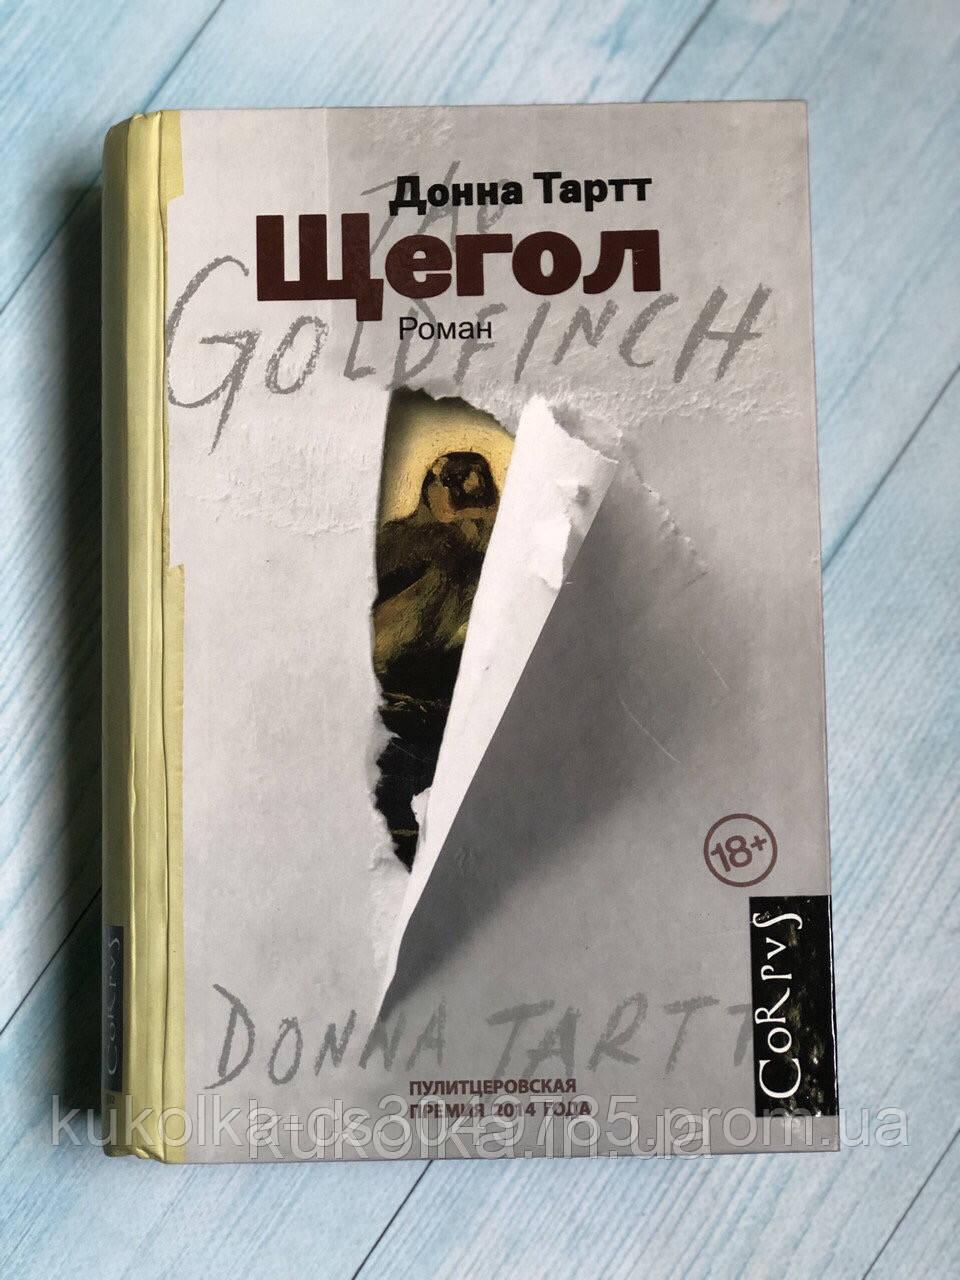 « Щегол » Донна Тартт